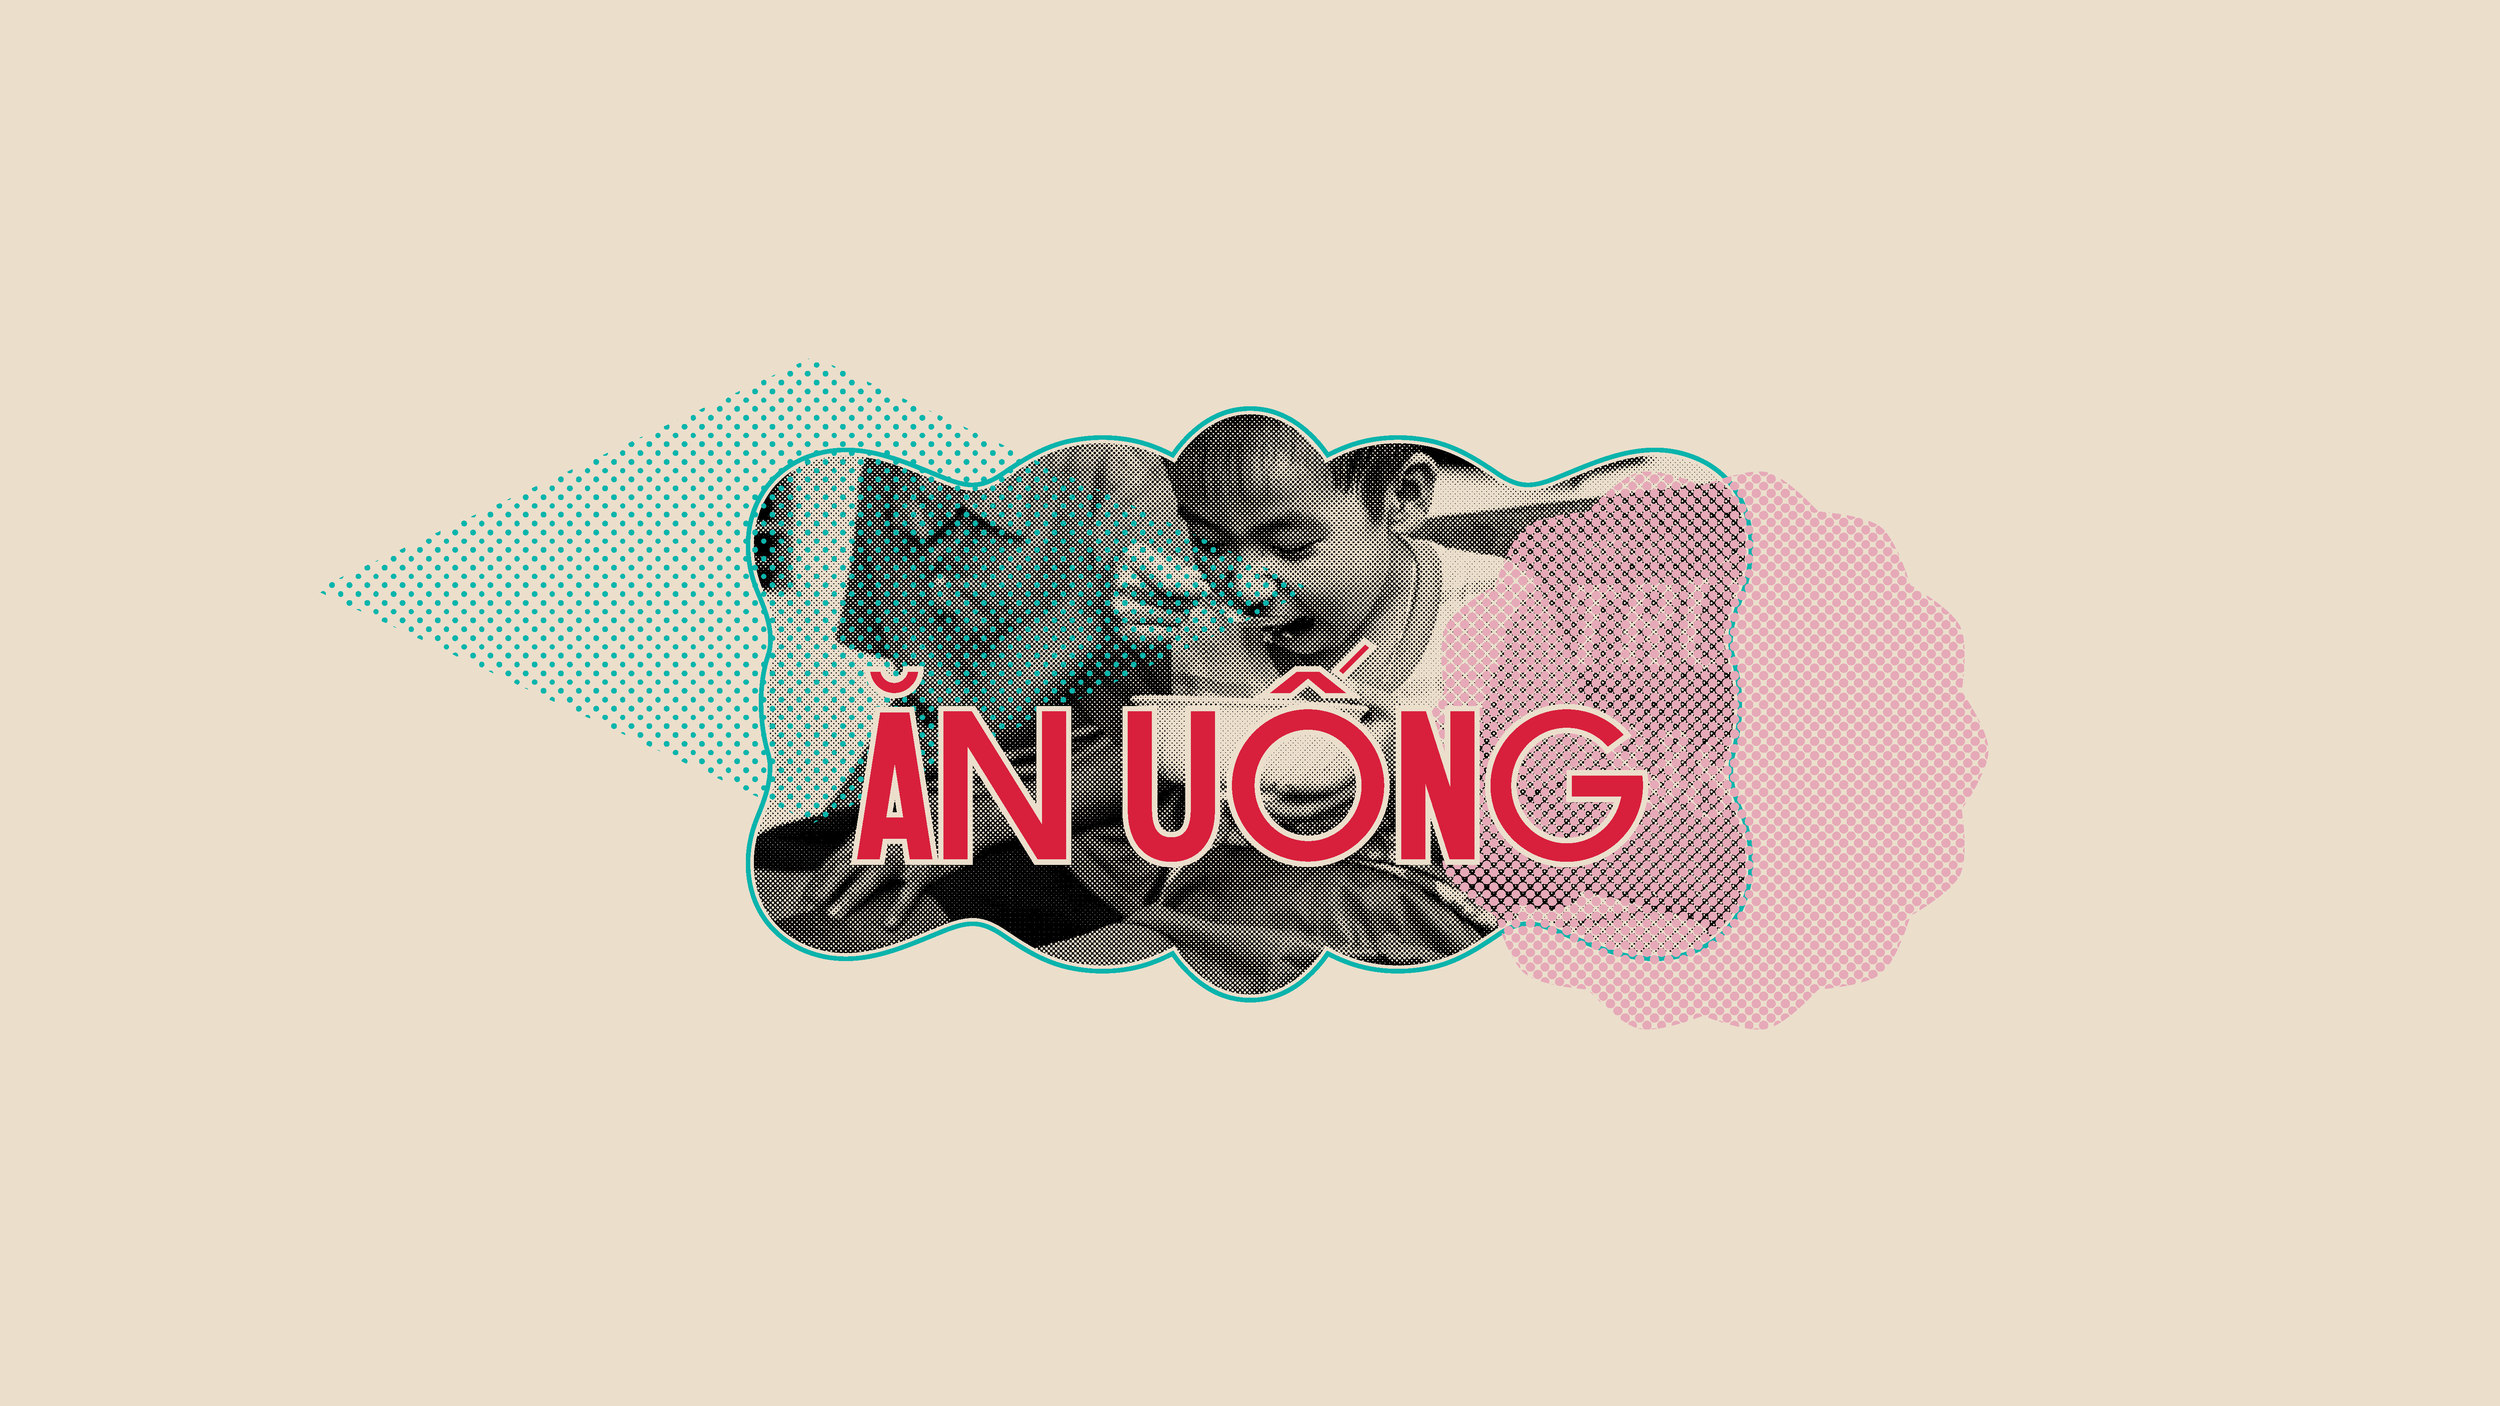 An Uong